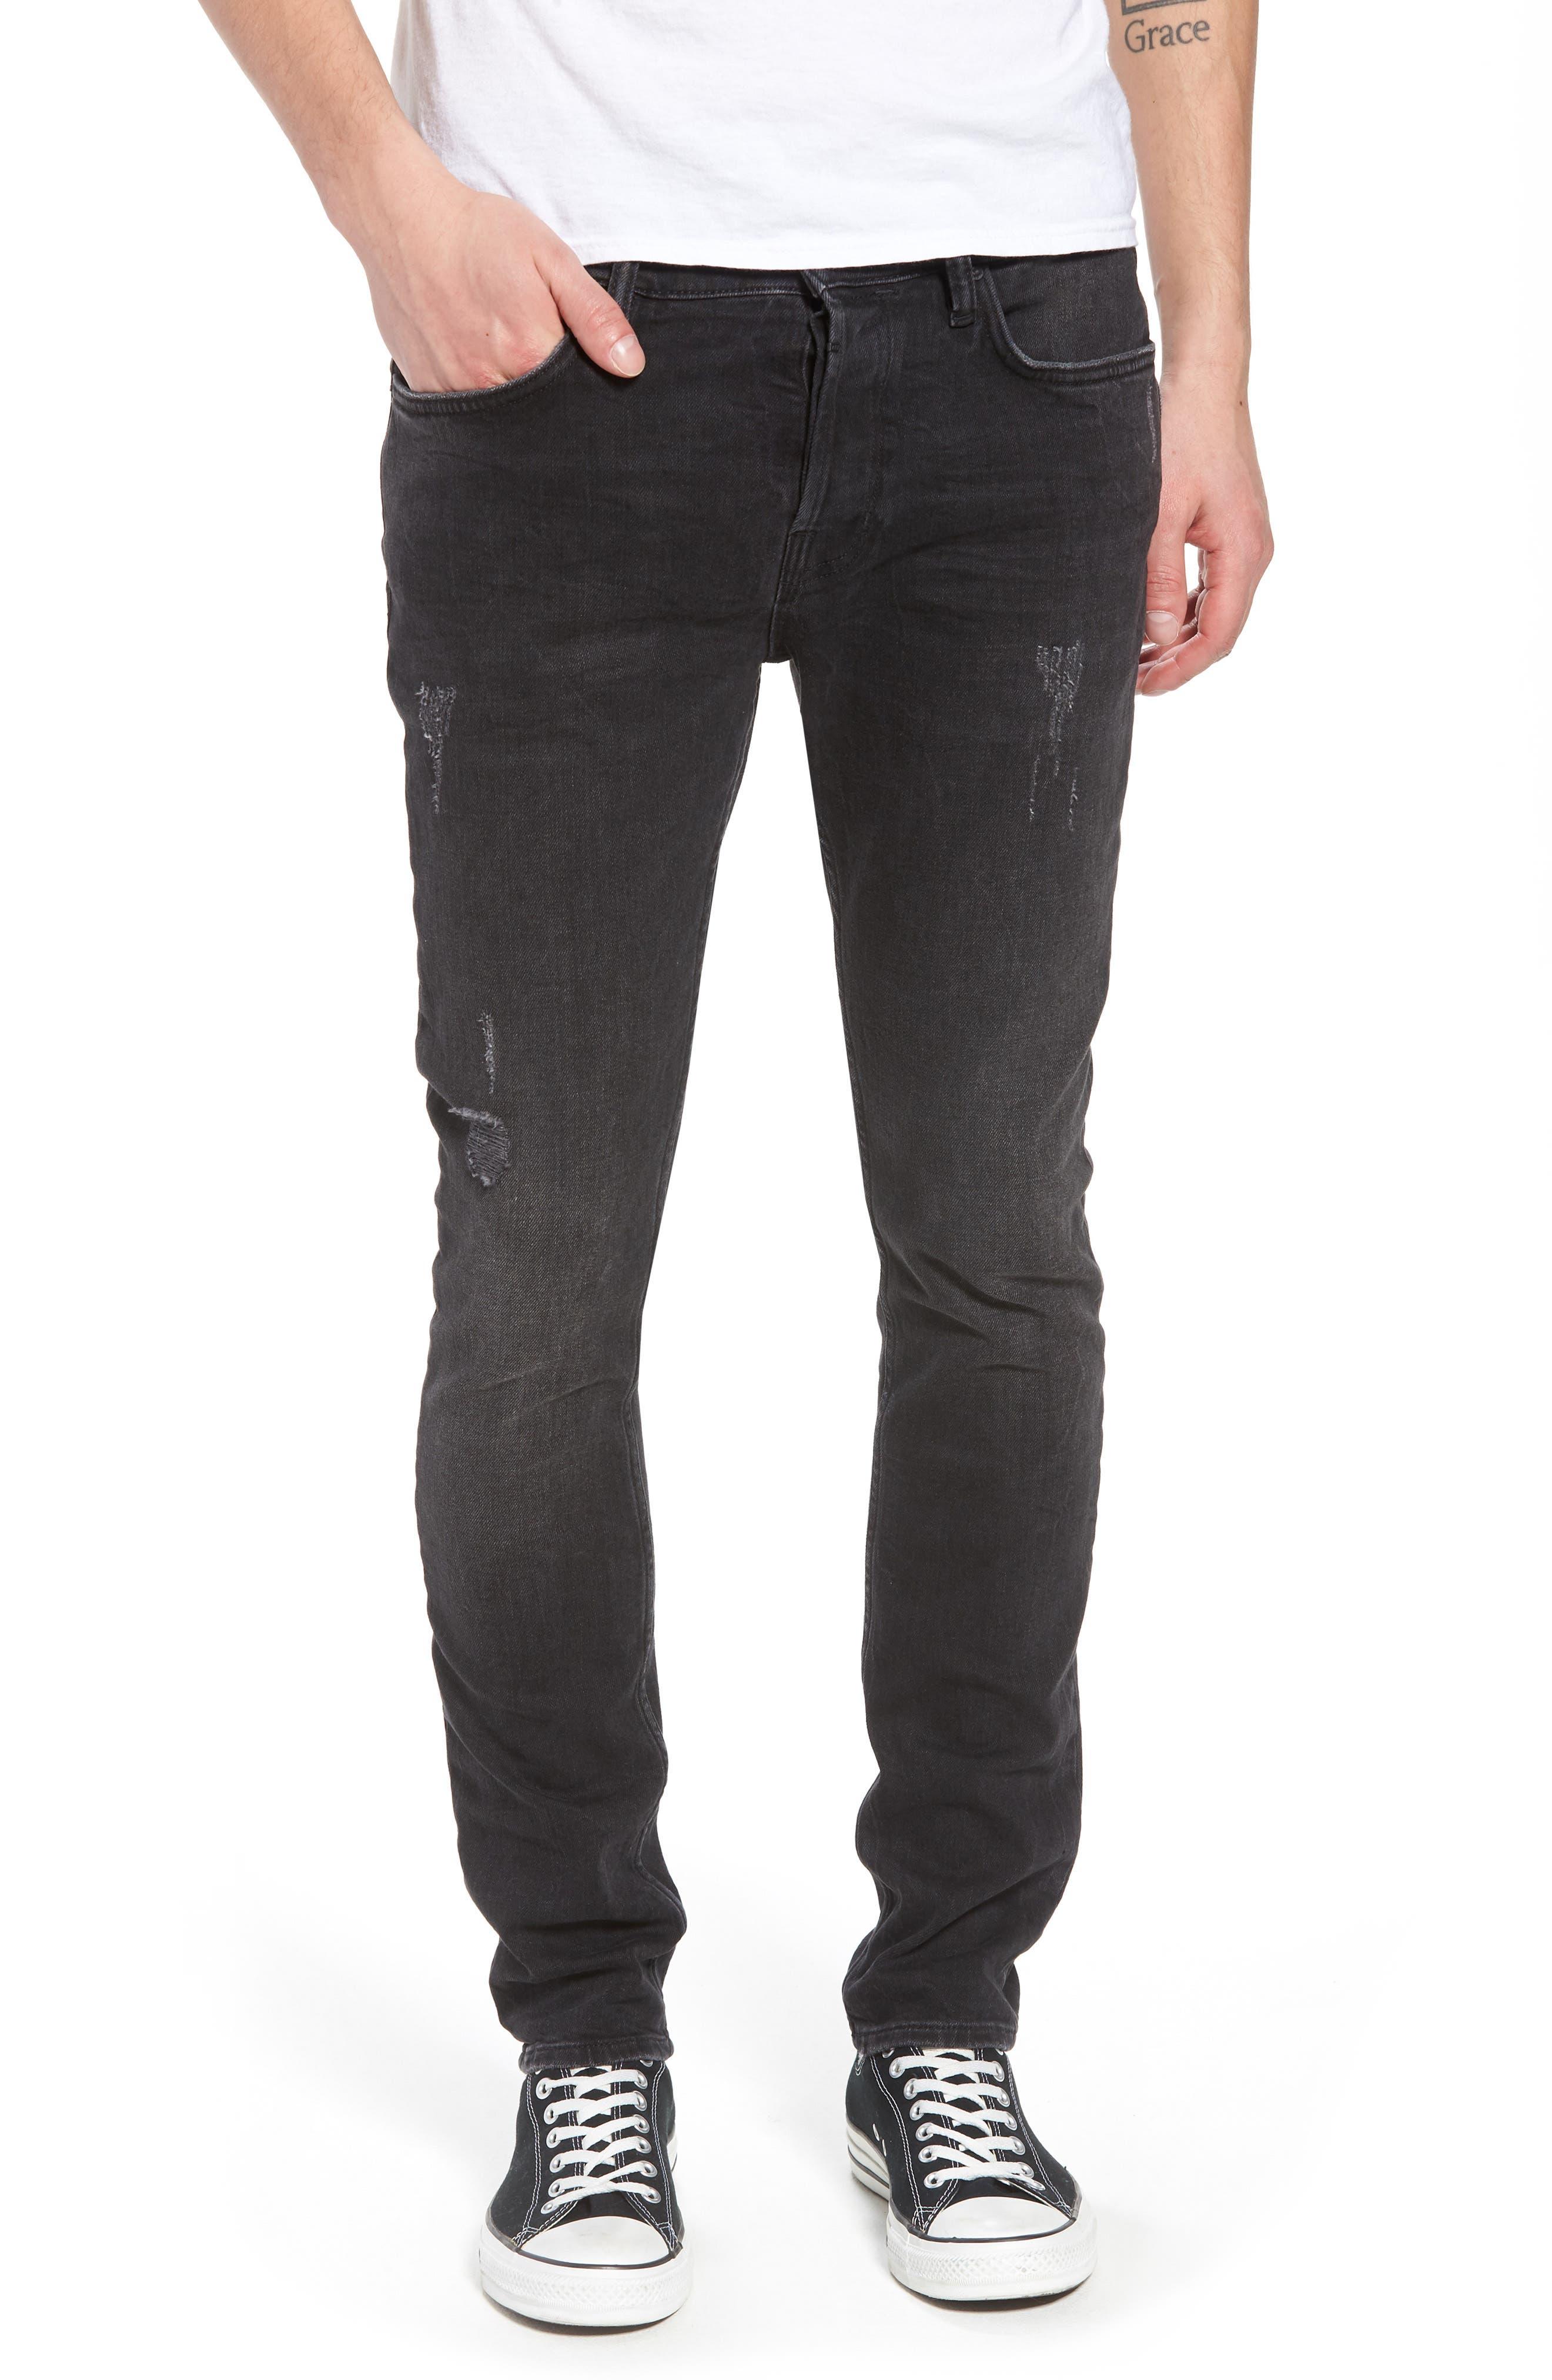 Raveline Skinny Fit Jeans,                             Main thumbnail 1, color,                             001